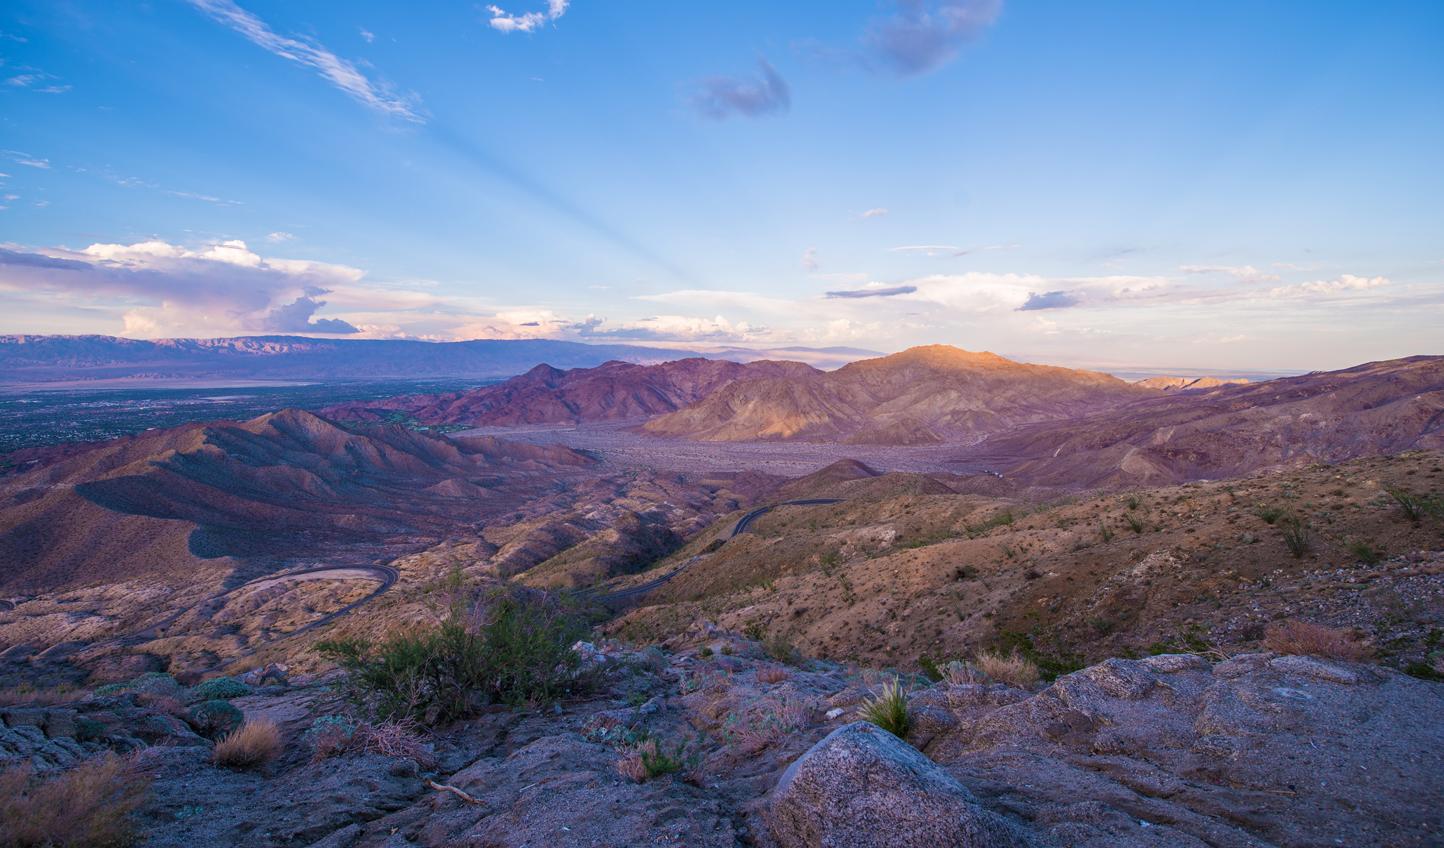 Watch the sun dip beyond Coachella Valley